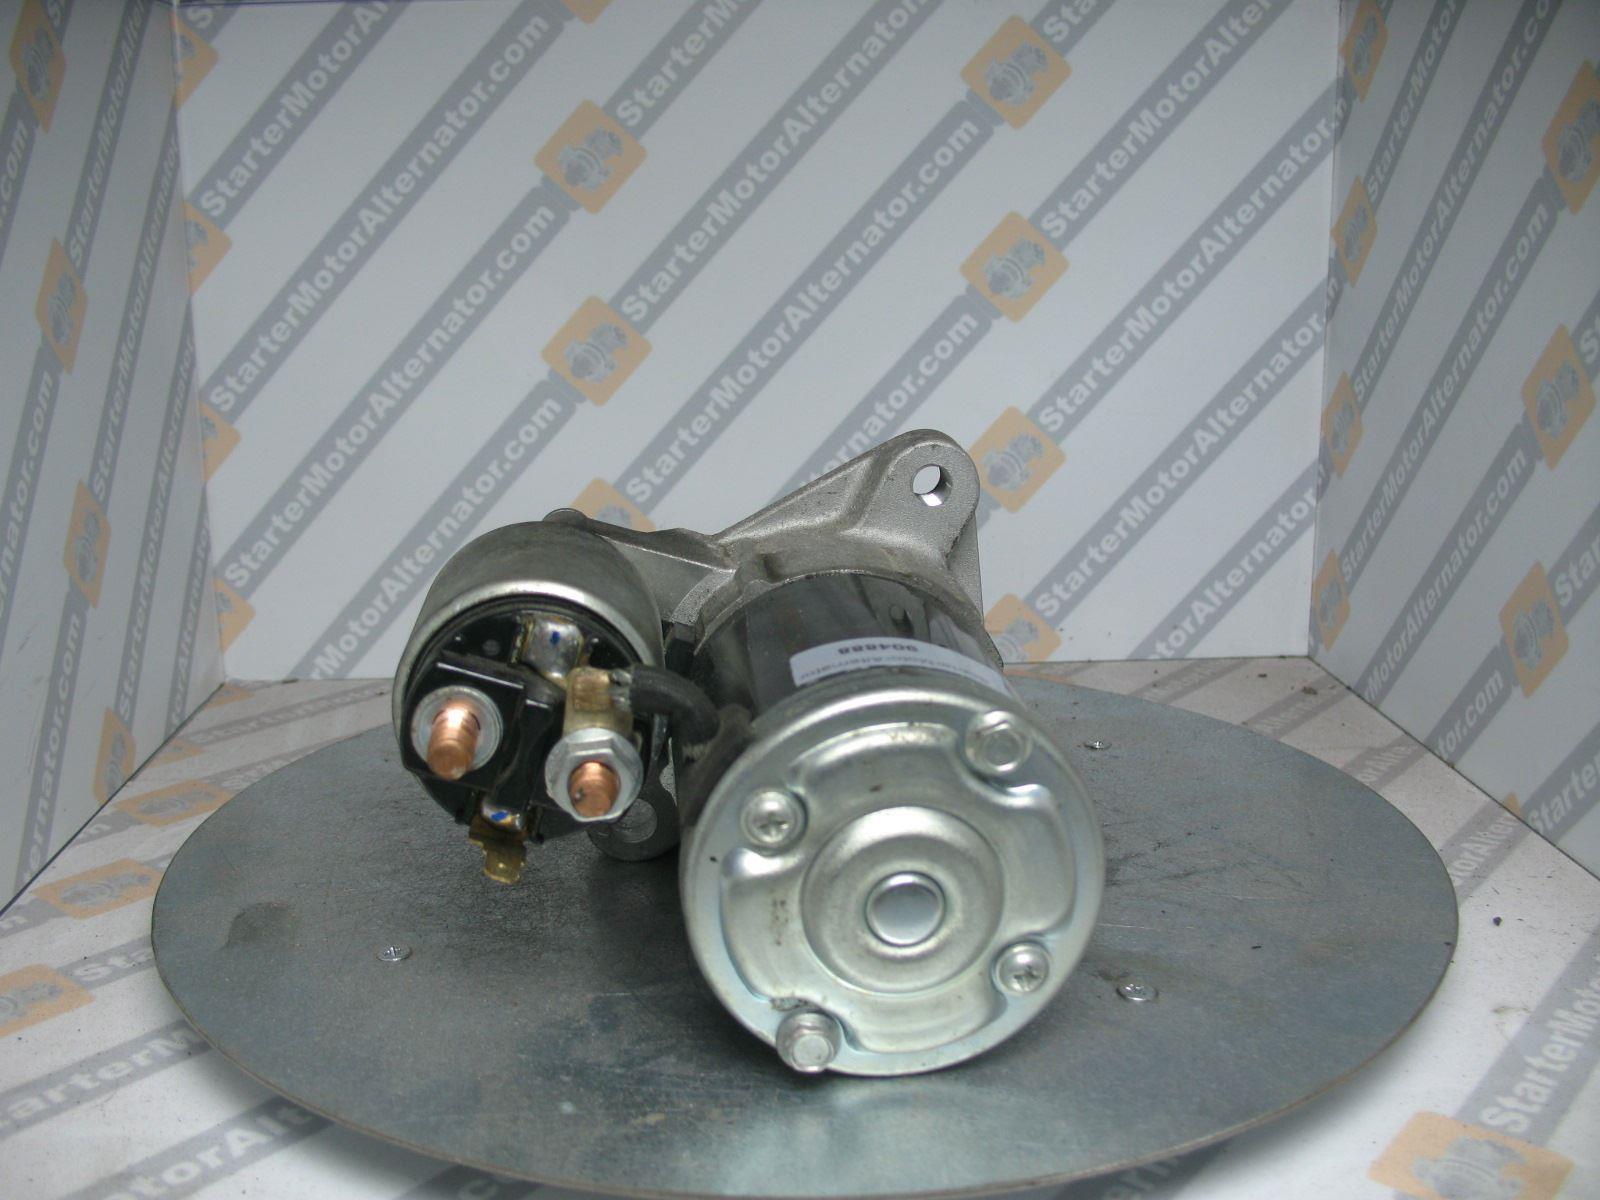 XIY2561 Starter Motor For Opel / Suzuki / Vauxhall